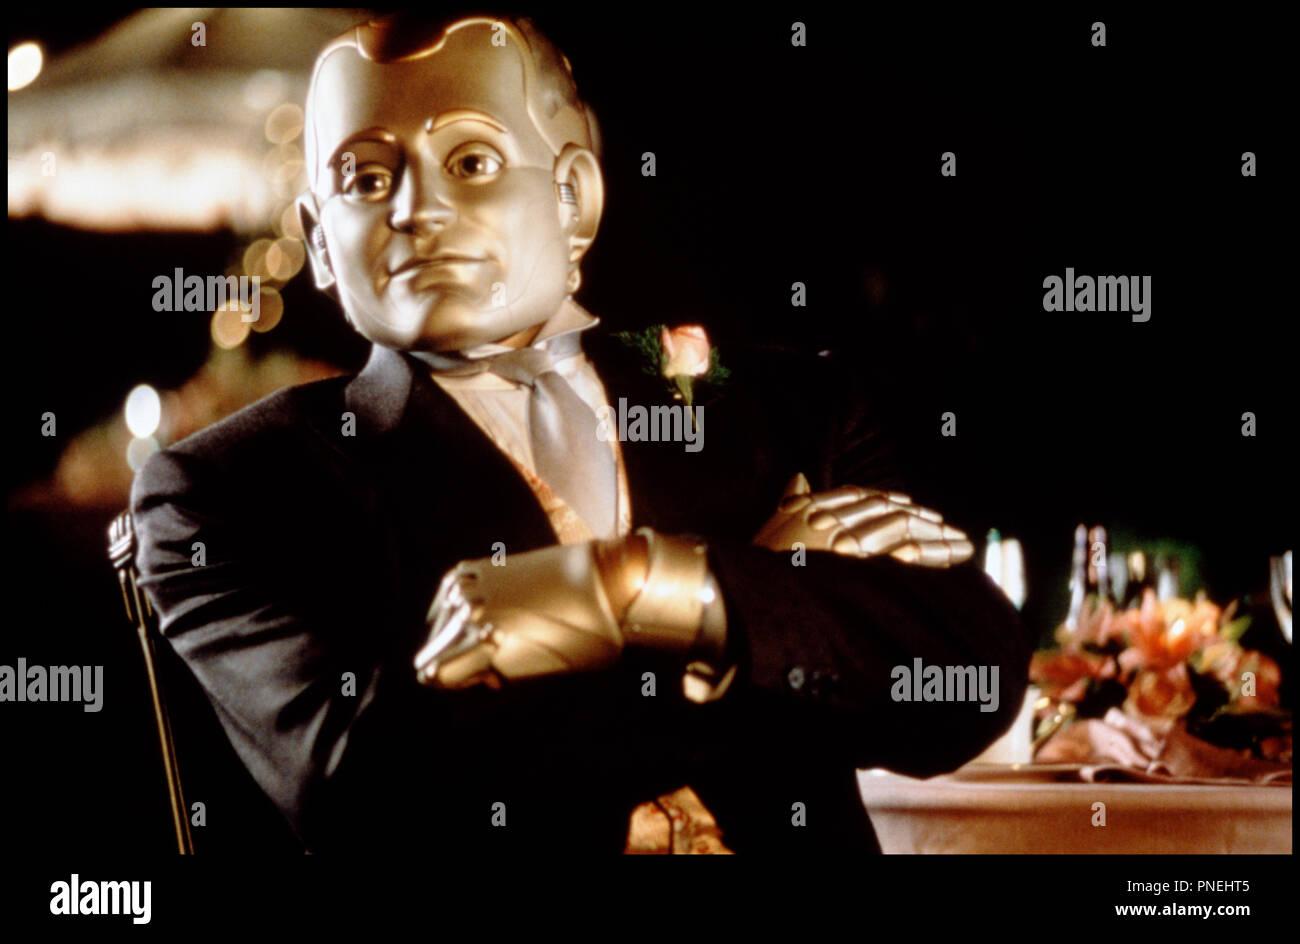 Prod DB © Columbia / DR L'HOMME BICENTENAIRE (BICENTENNIAL MAN) de Chris Columbus 1999 USA avec Robin Williams robot d'apres le roman de Isaac Asimov - Stock Image